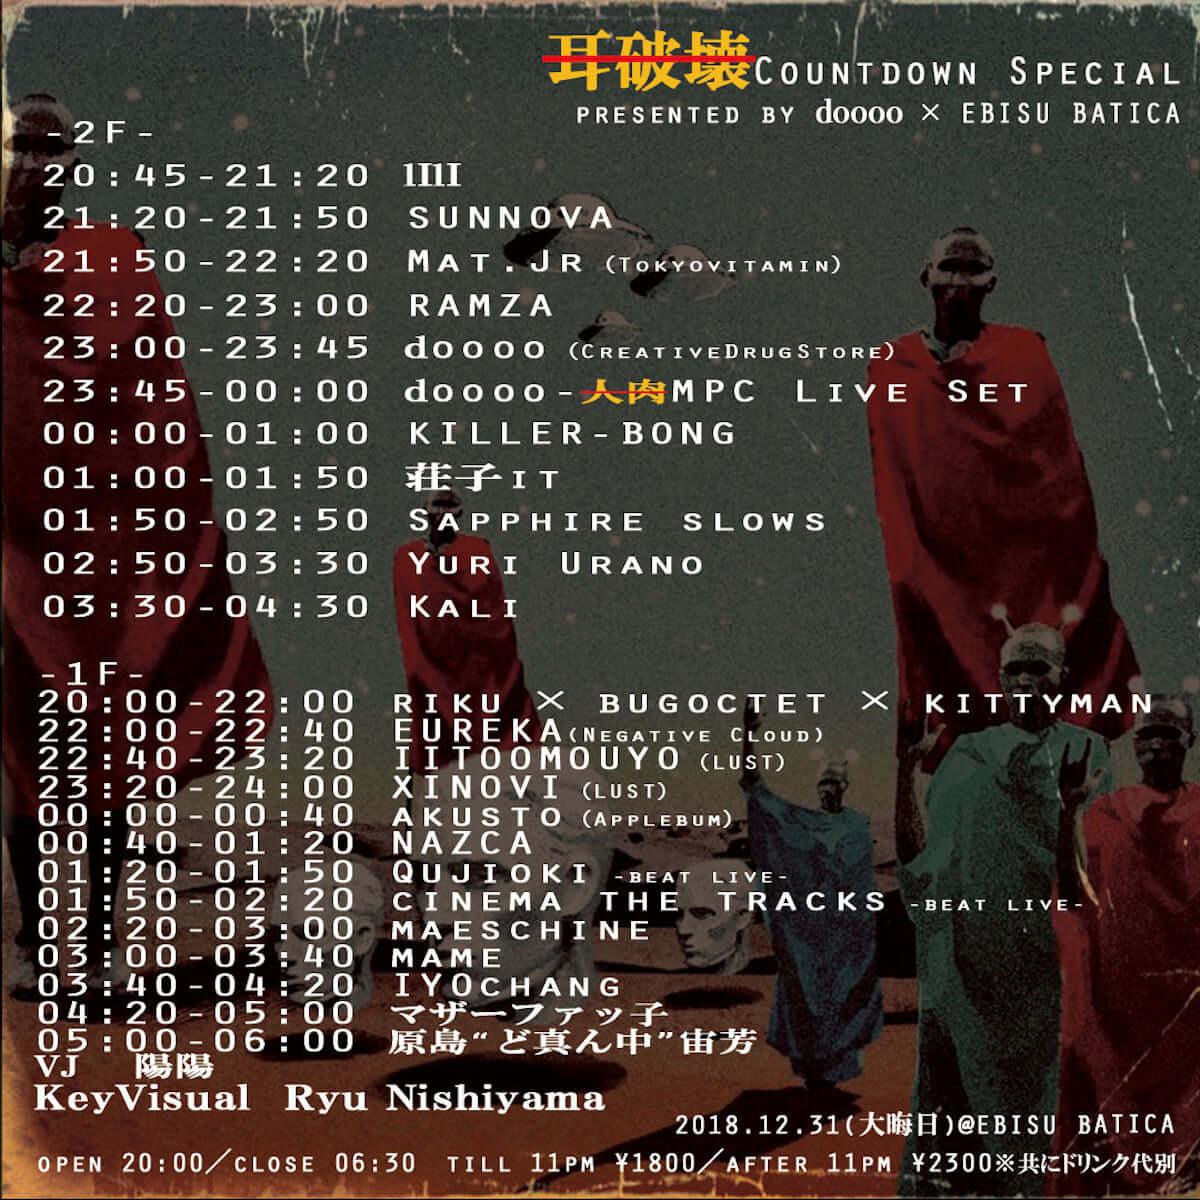 EBISU BATICAの2019年カウントダウンはdooooによる人肉MPC LIVE SET|タイムテーブルが公開に music181229-batica-countdown-2019-1-1200x1200